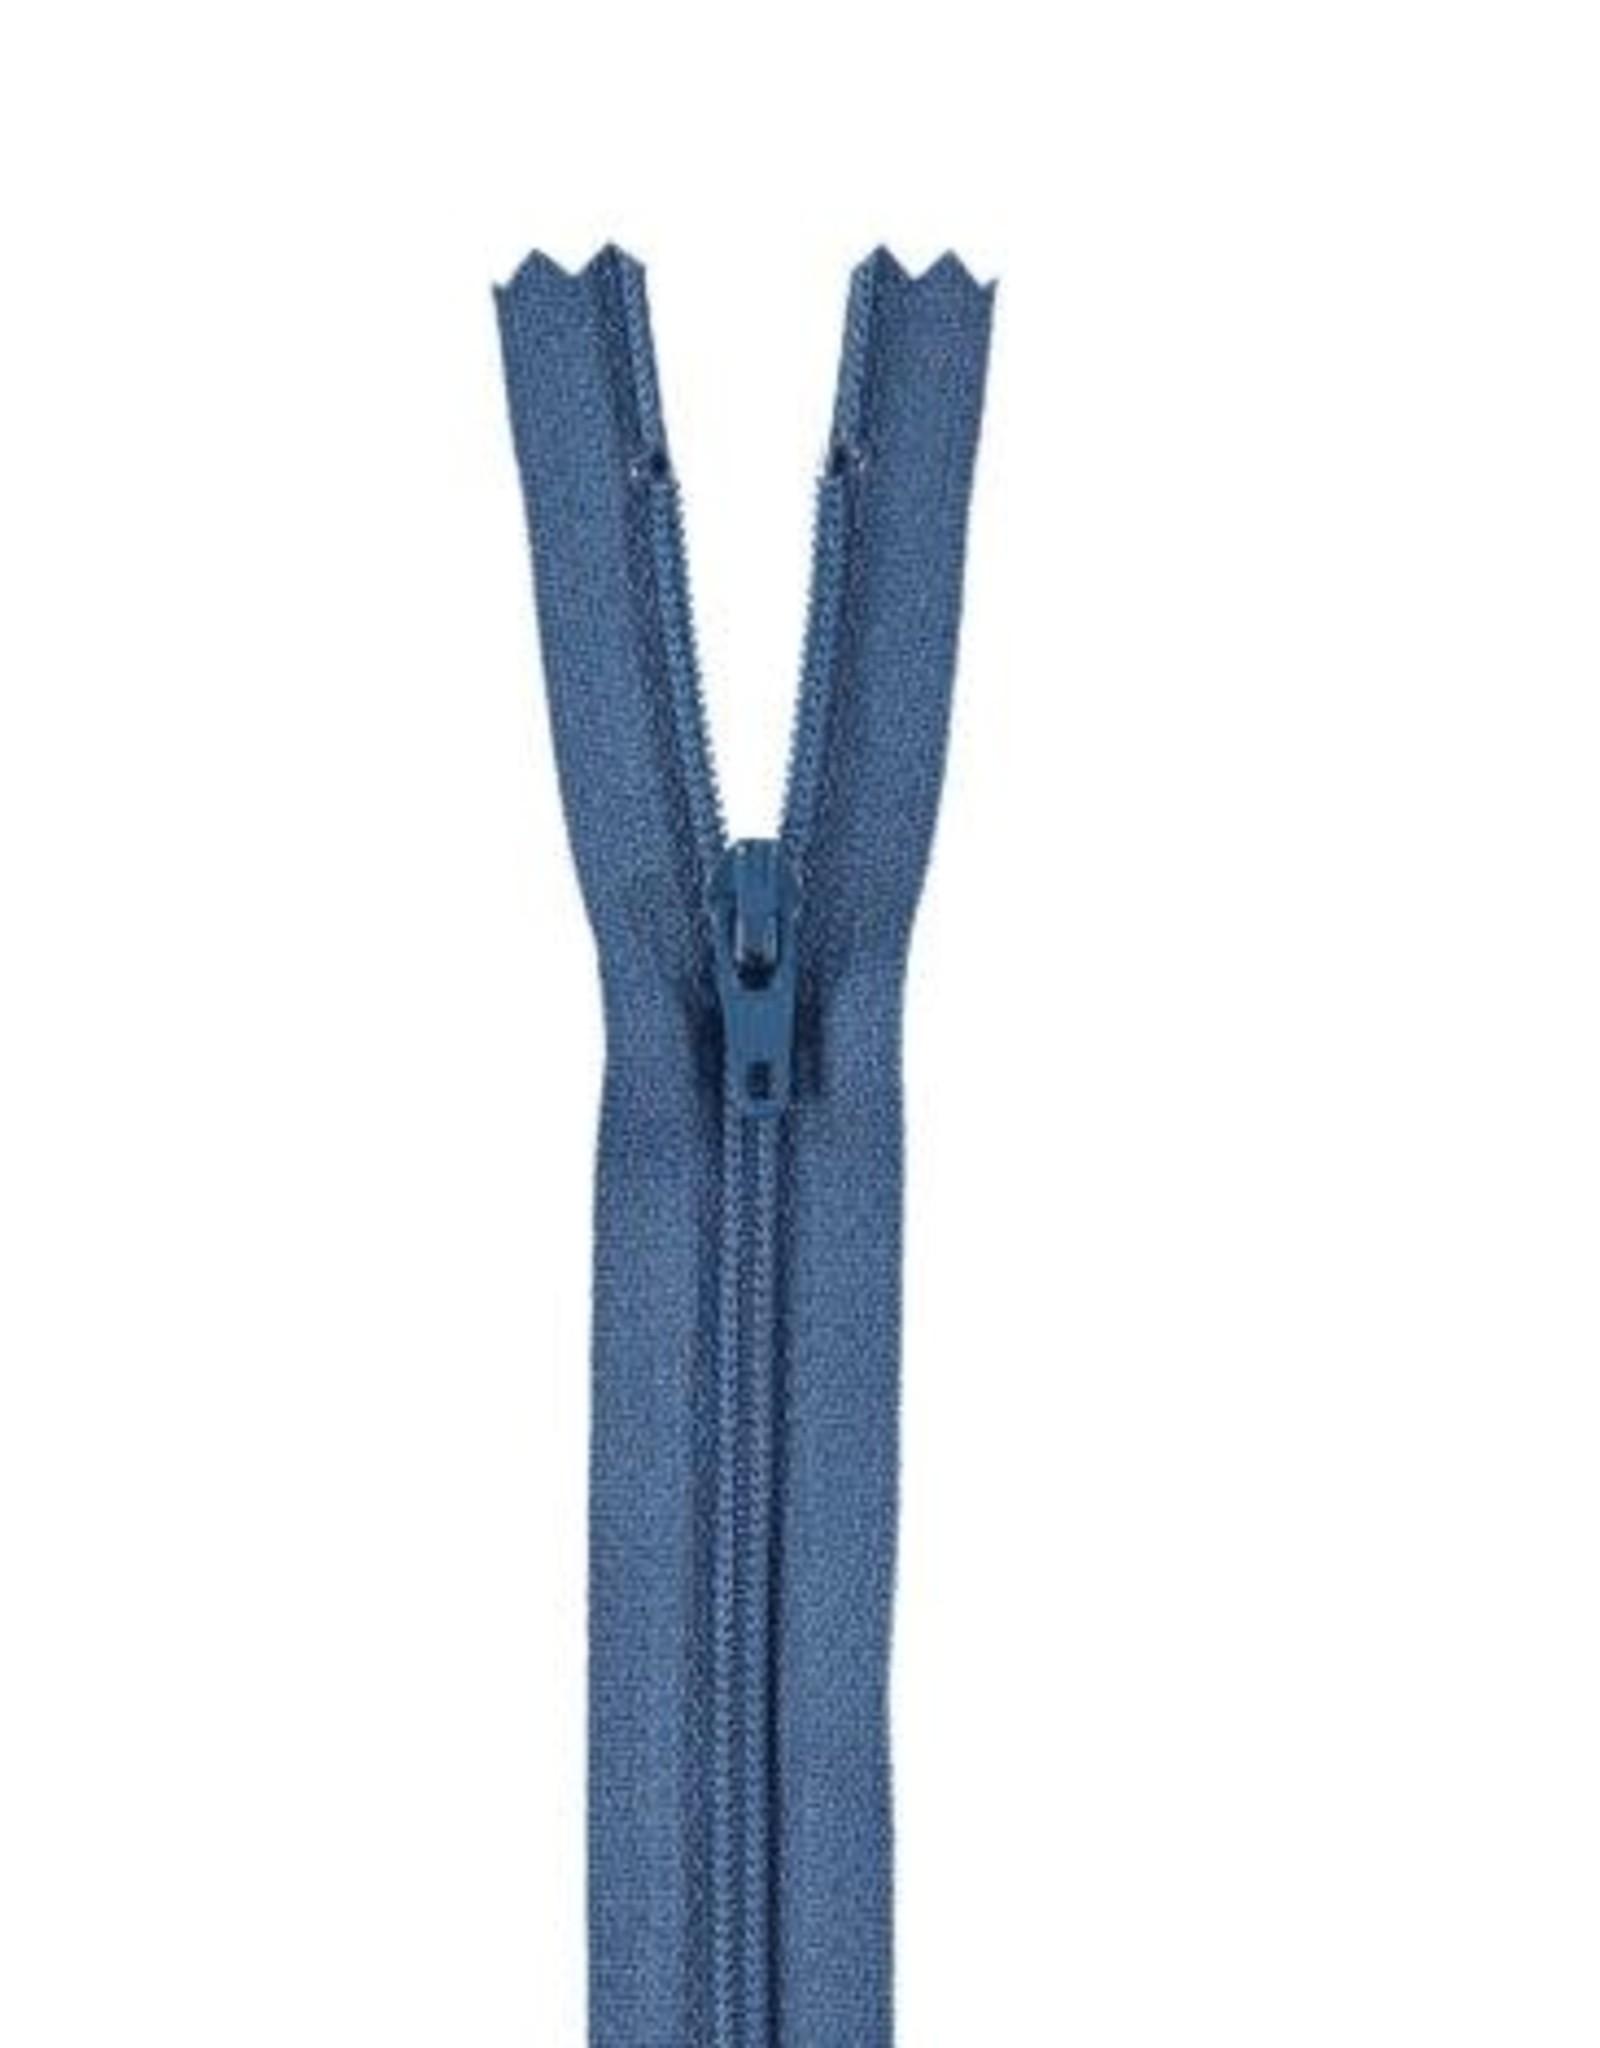 YKK Spiraalrits niet-DB 3mm jeansblauw 839-30cm